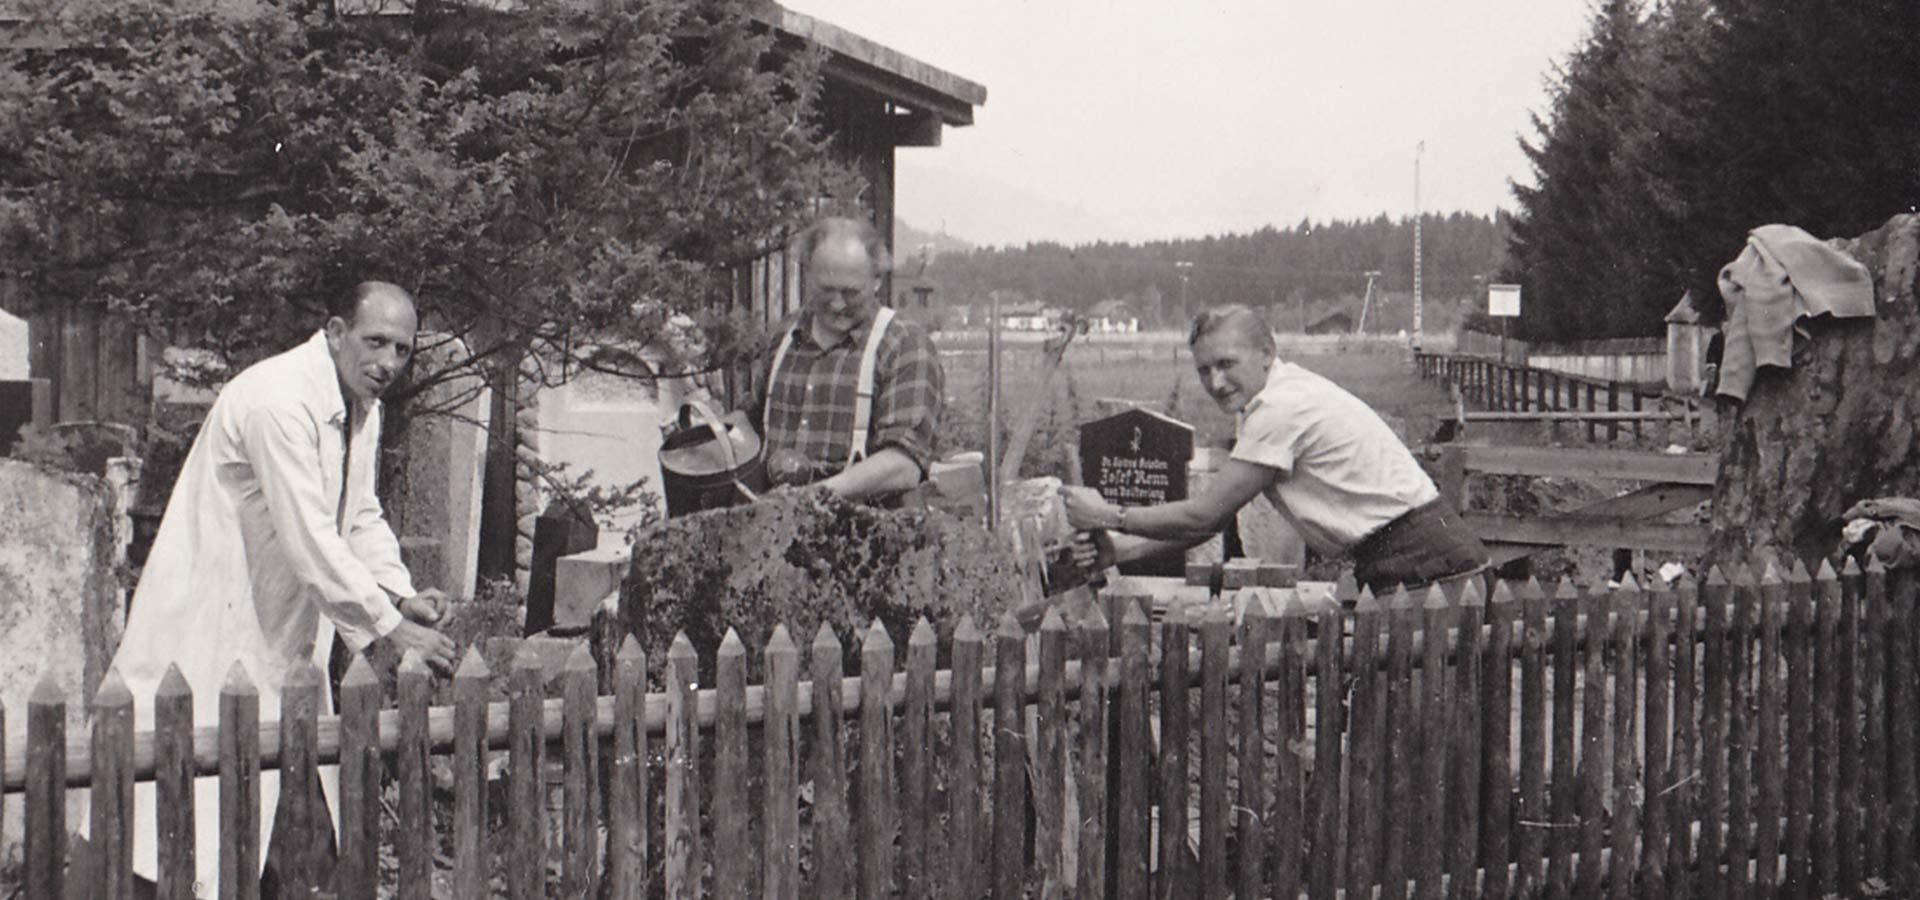 Steinmetzbetrieb mit Tradition!